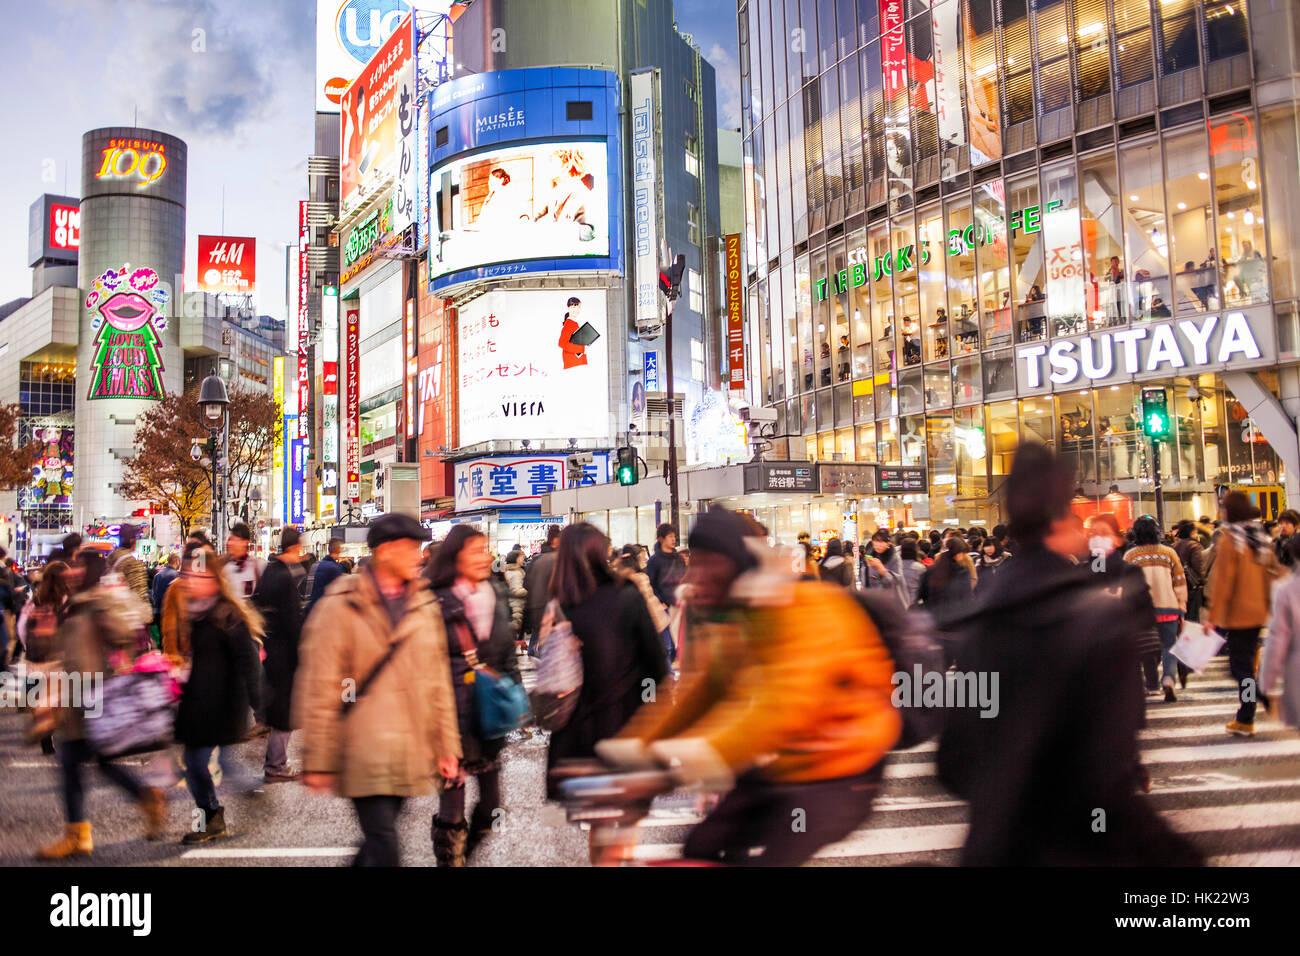 Rush hour, Shibuya Scramble Kousaten crossing, Hachiko square, Tokyo, Japan - Stock Image